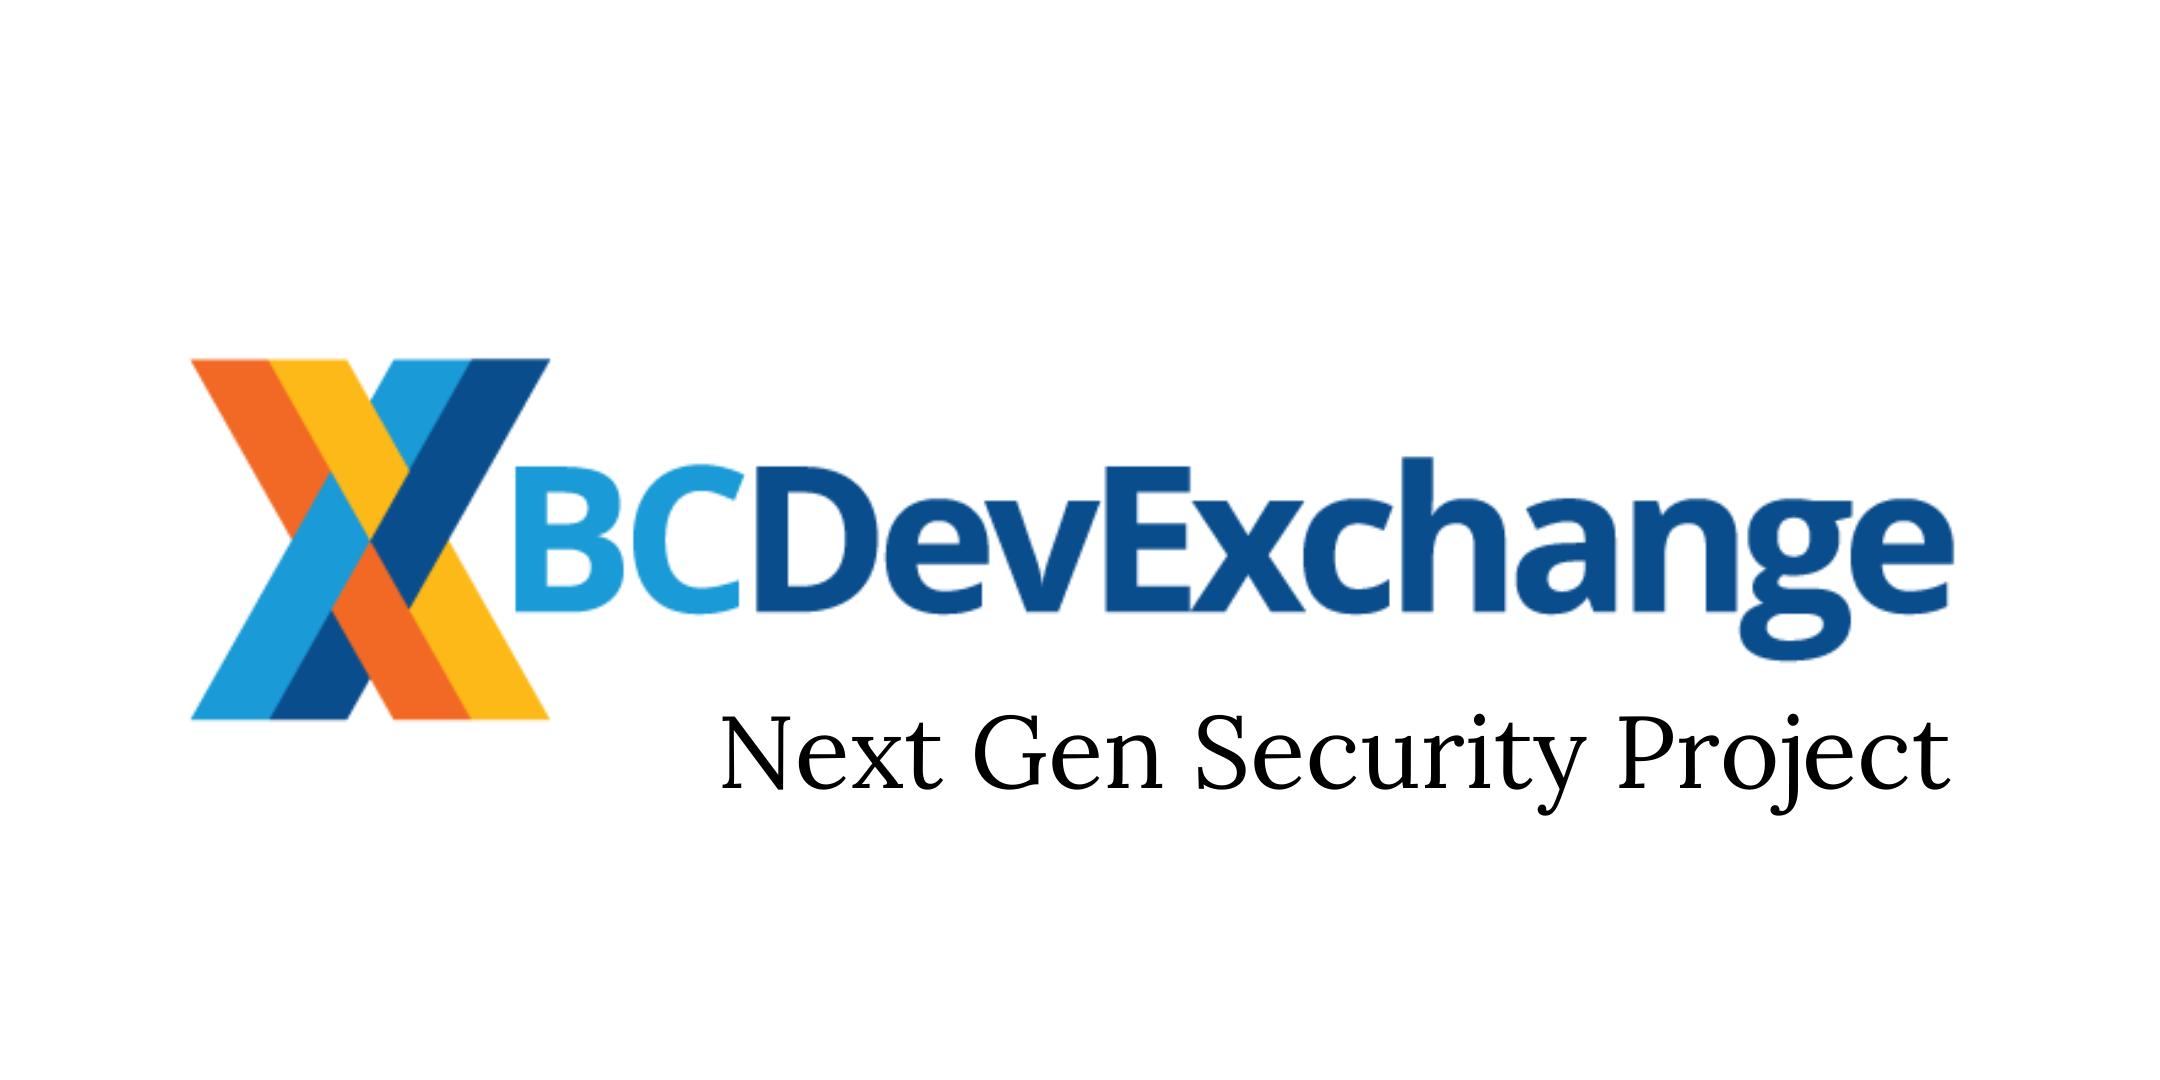 BCDevExchange